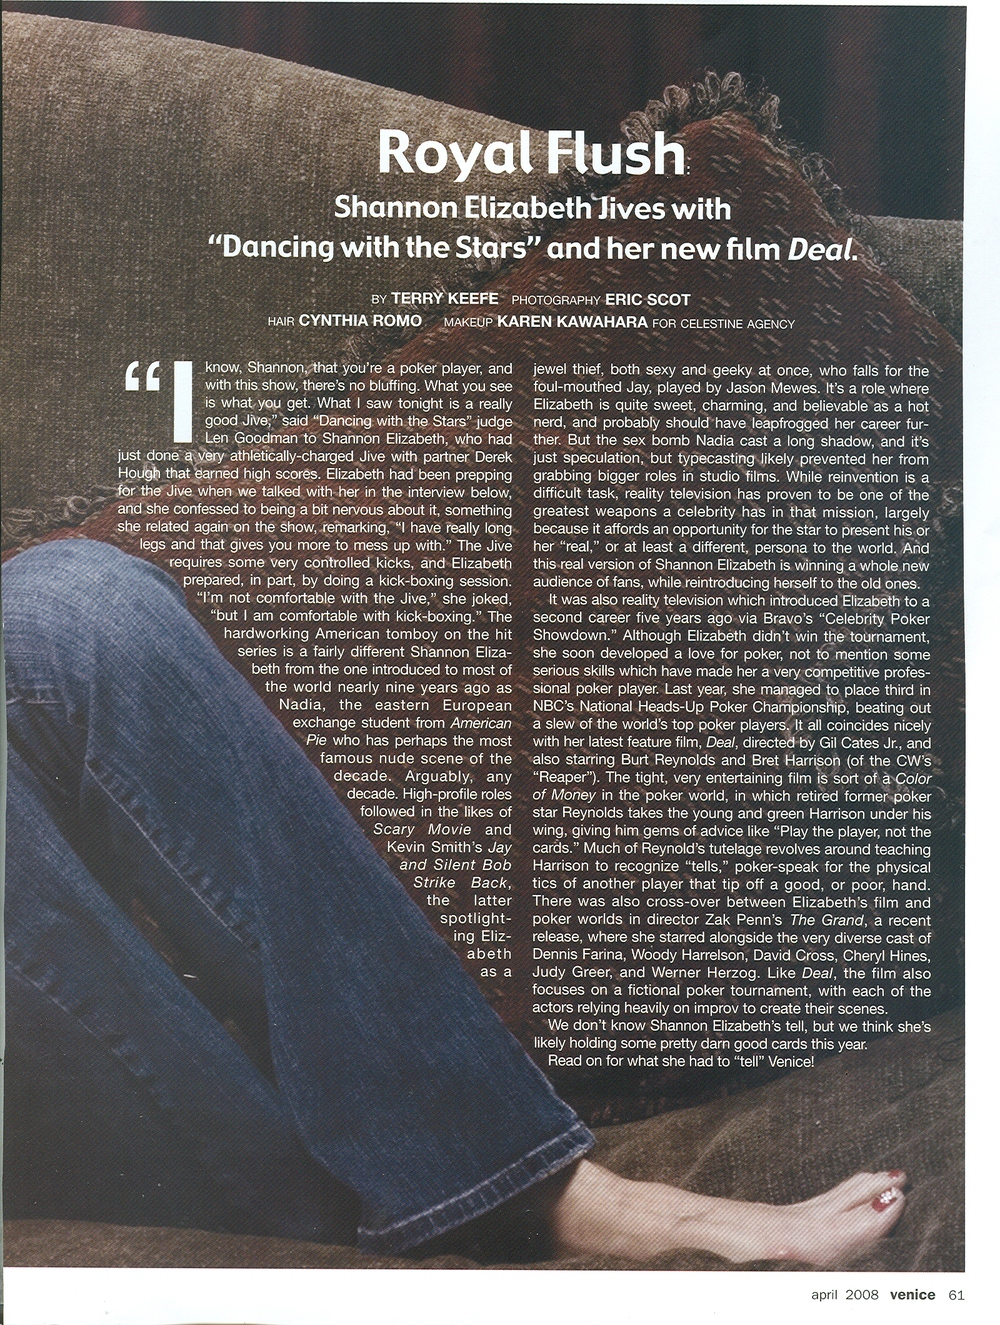 SE_Venice Magazine_April 2008 2.jpg